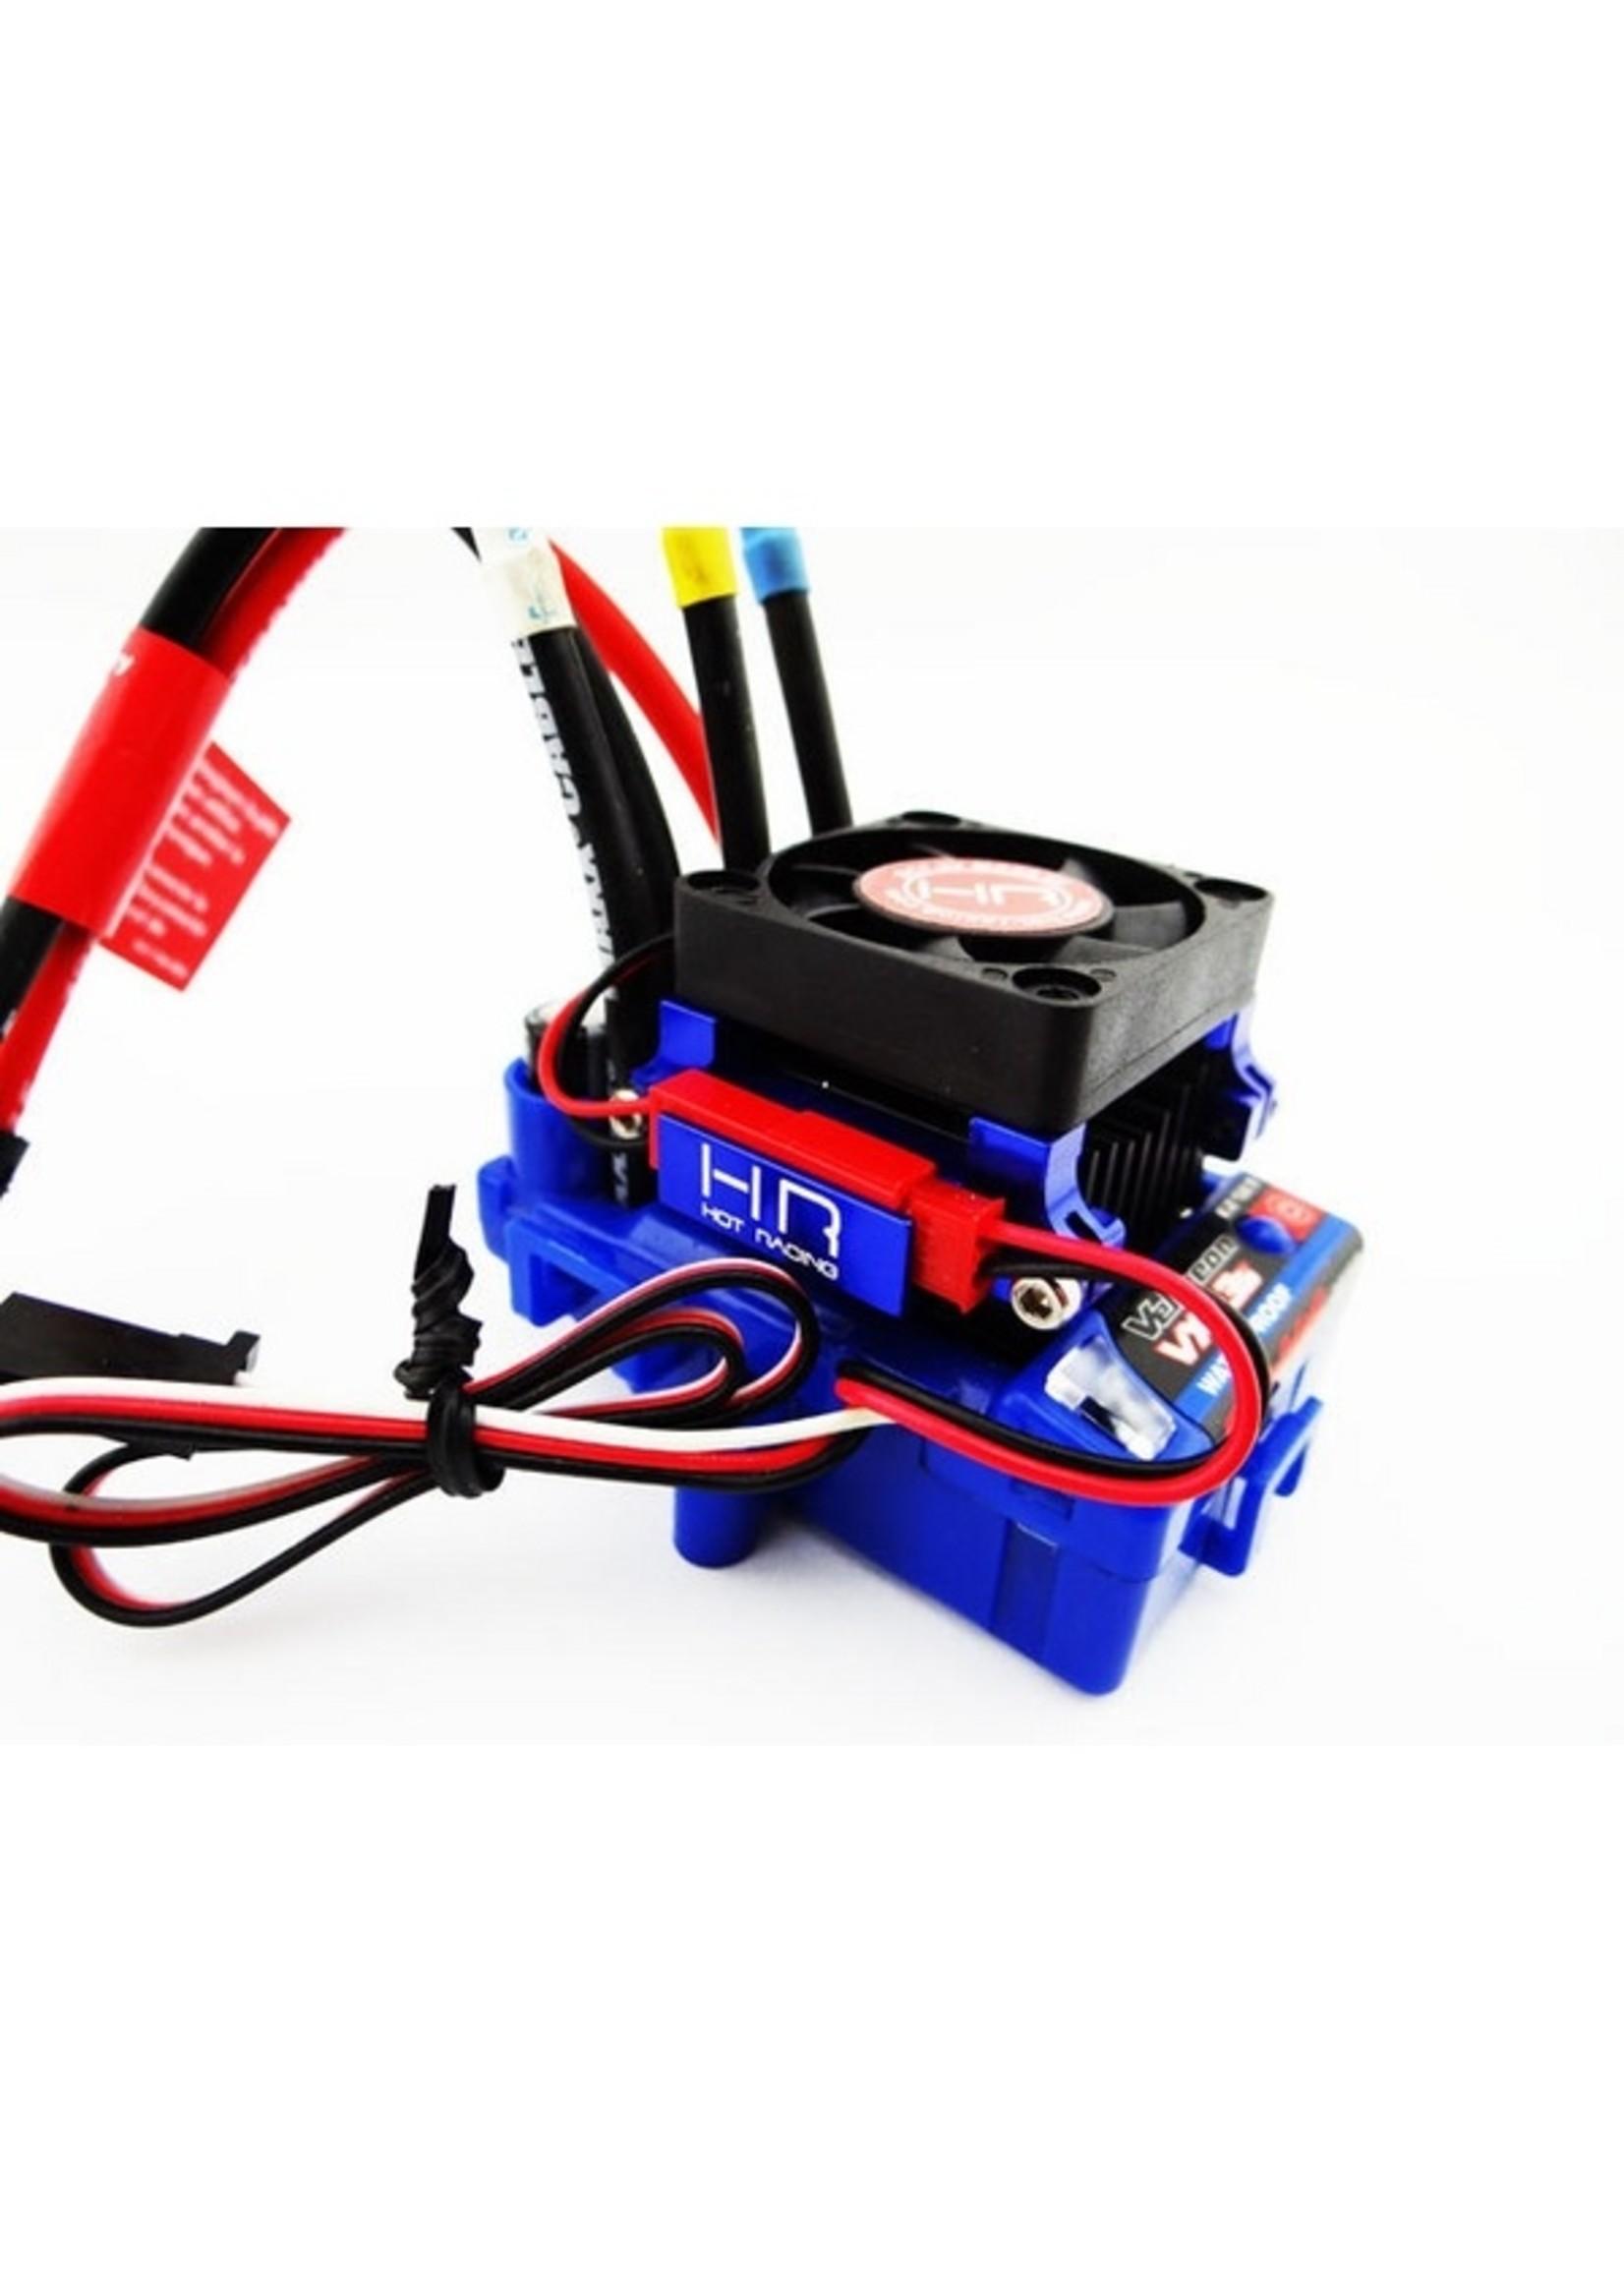 Hot Racing HRAESC303T06 Hot Racing Velineon VXL-3 ESC Heat Sink, High Velocity Fan